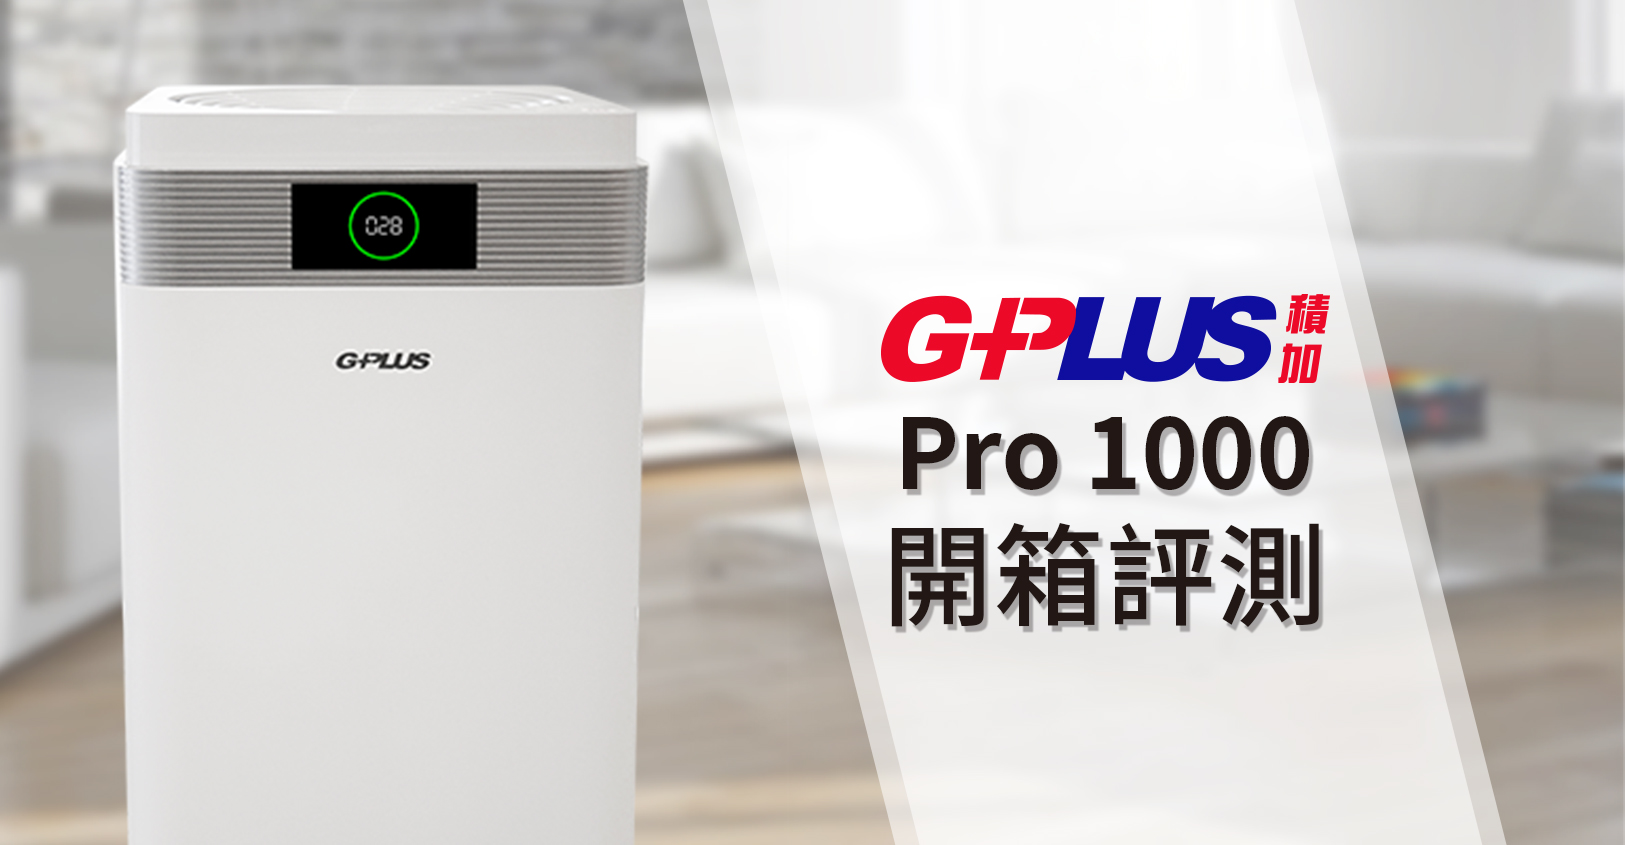 GPLUS Pro 1000 開箱與深度評測:全市場最高 CADR 1000 m3/h 極致吸力與氣流循環效果,搭配複合功能濾網,創造真正「有感」潔淨呼吸體驗!